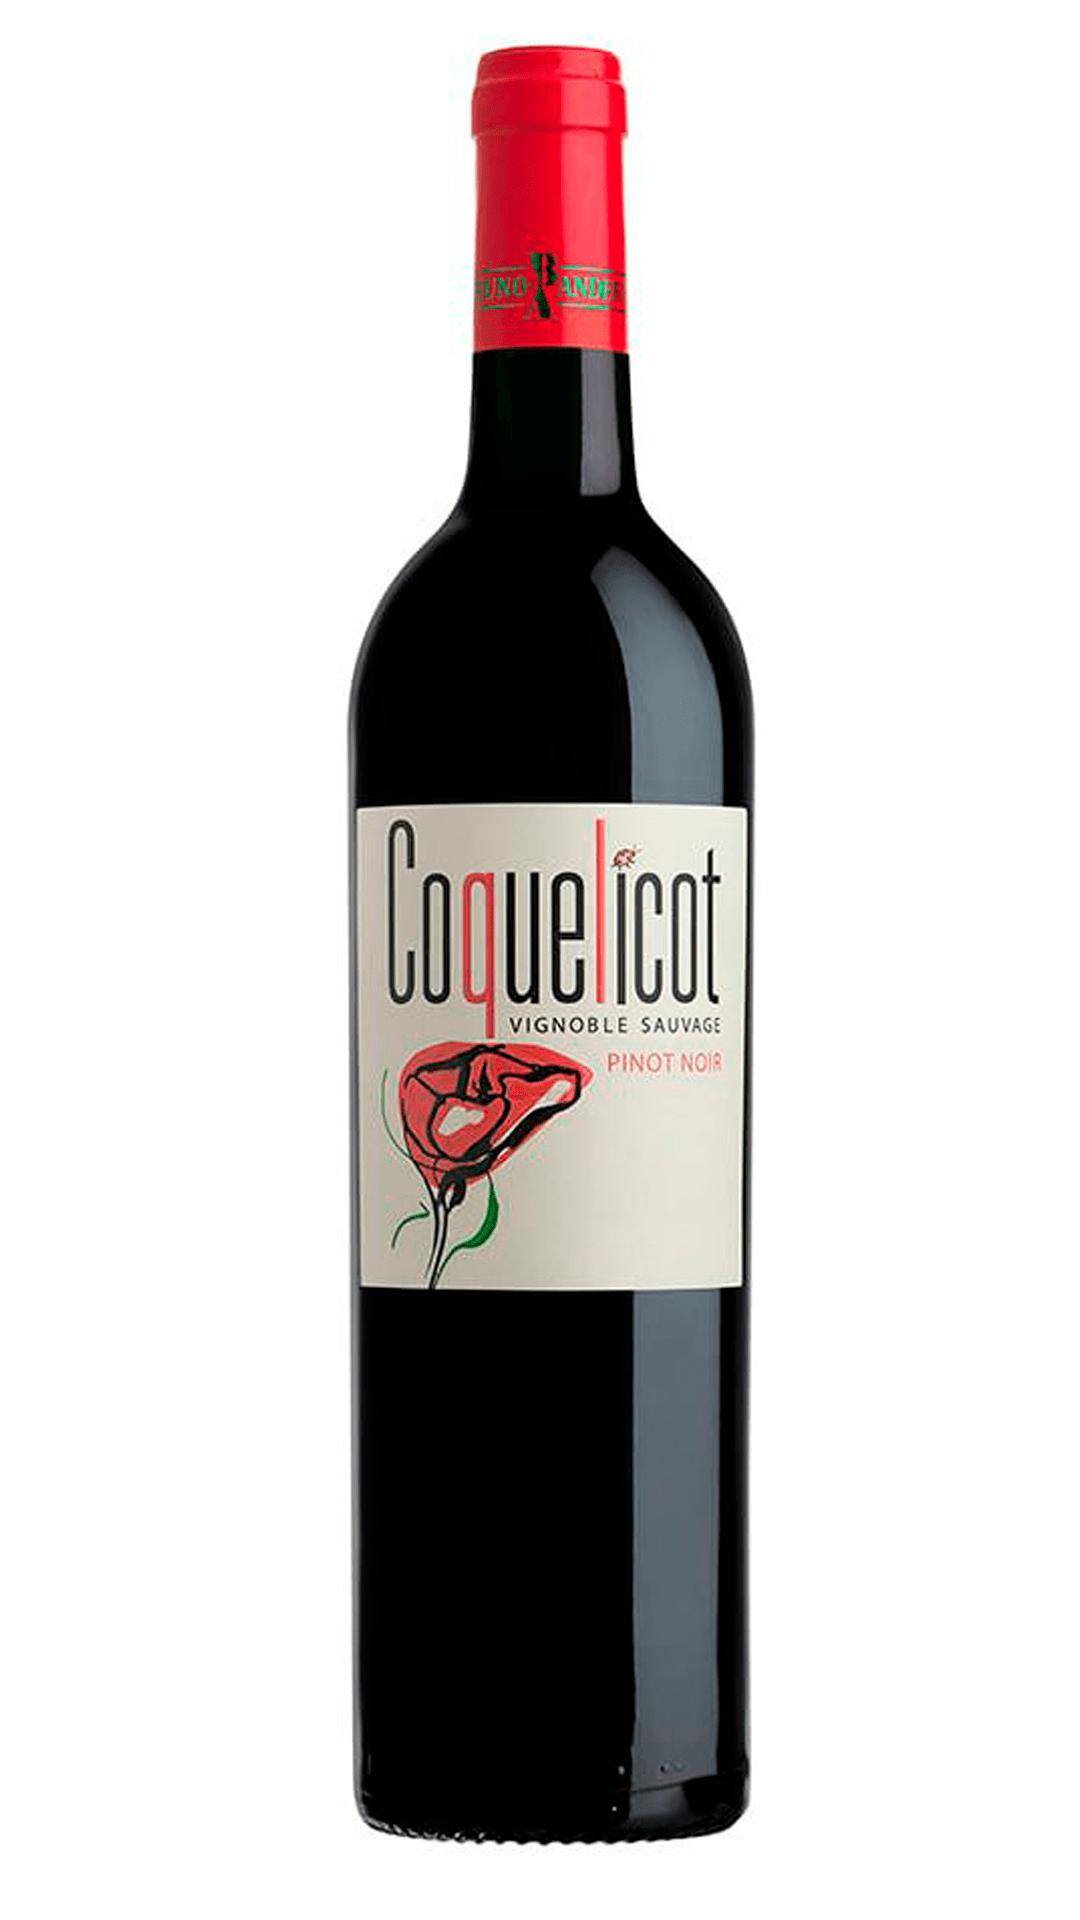 Bruno-Andreu-Coquelicot-Pinot-Noir-2019